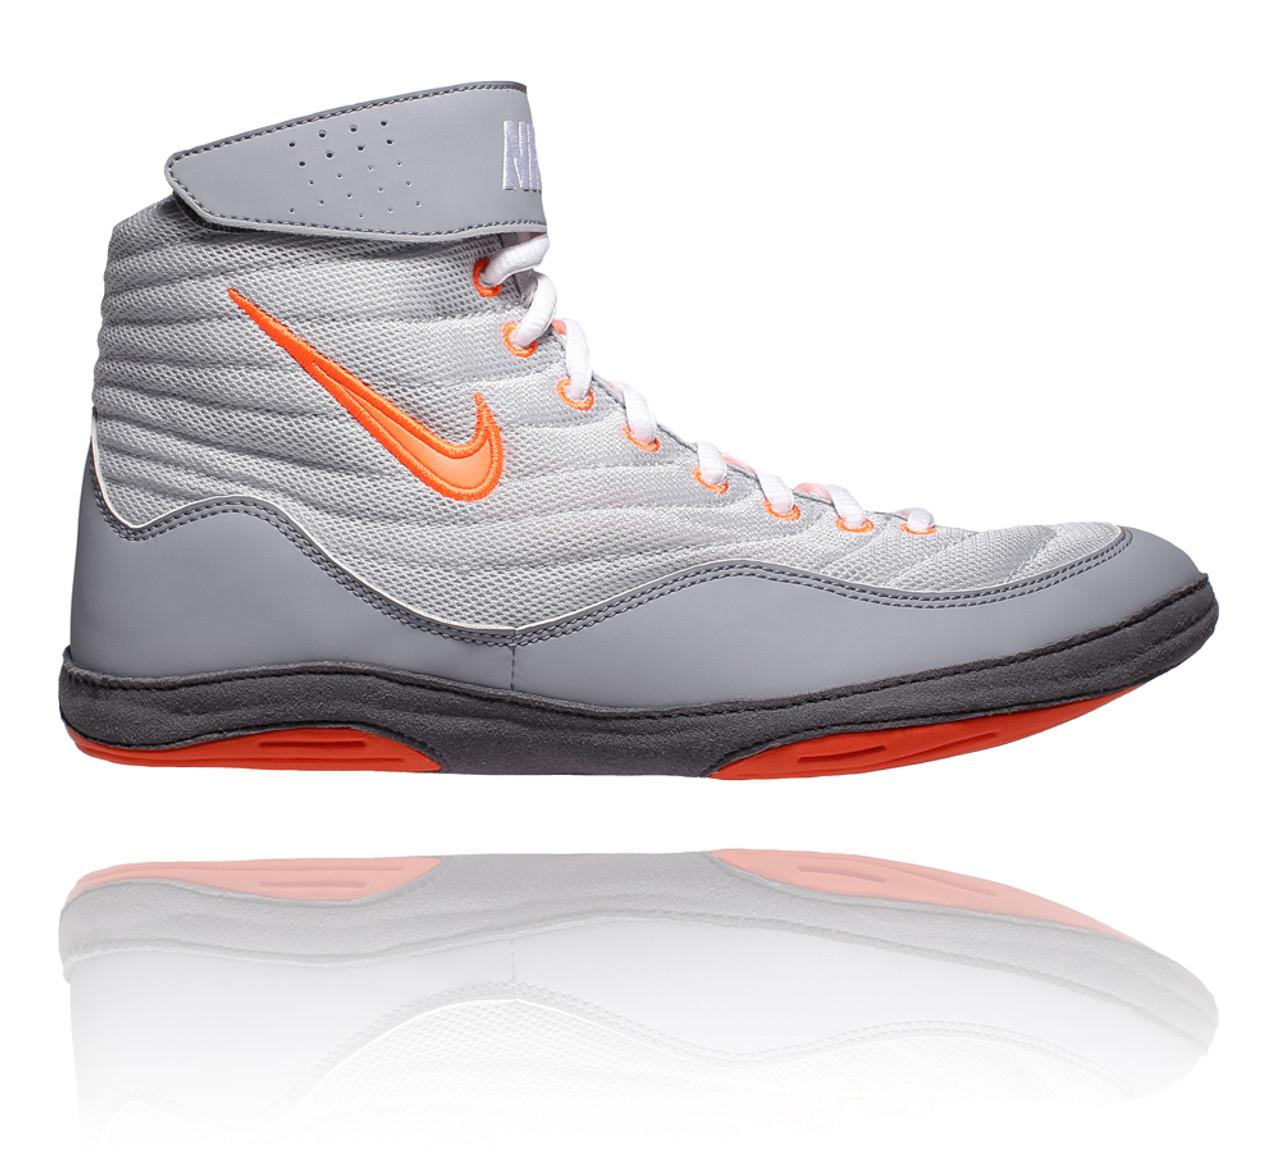 6e1d09ffb23 Nike Inflict 3 - Pure Plat Total Orange Stealth Dark Grey